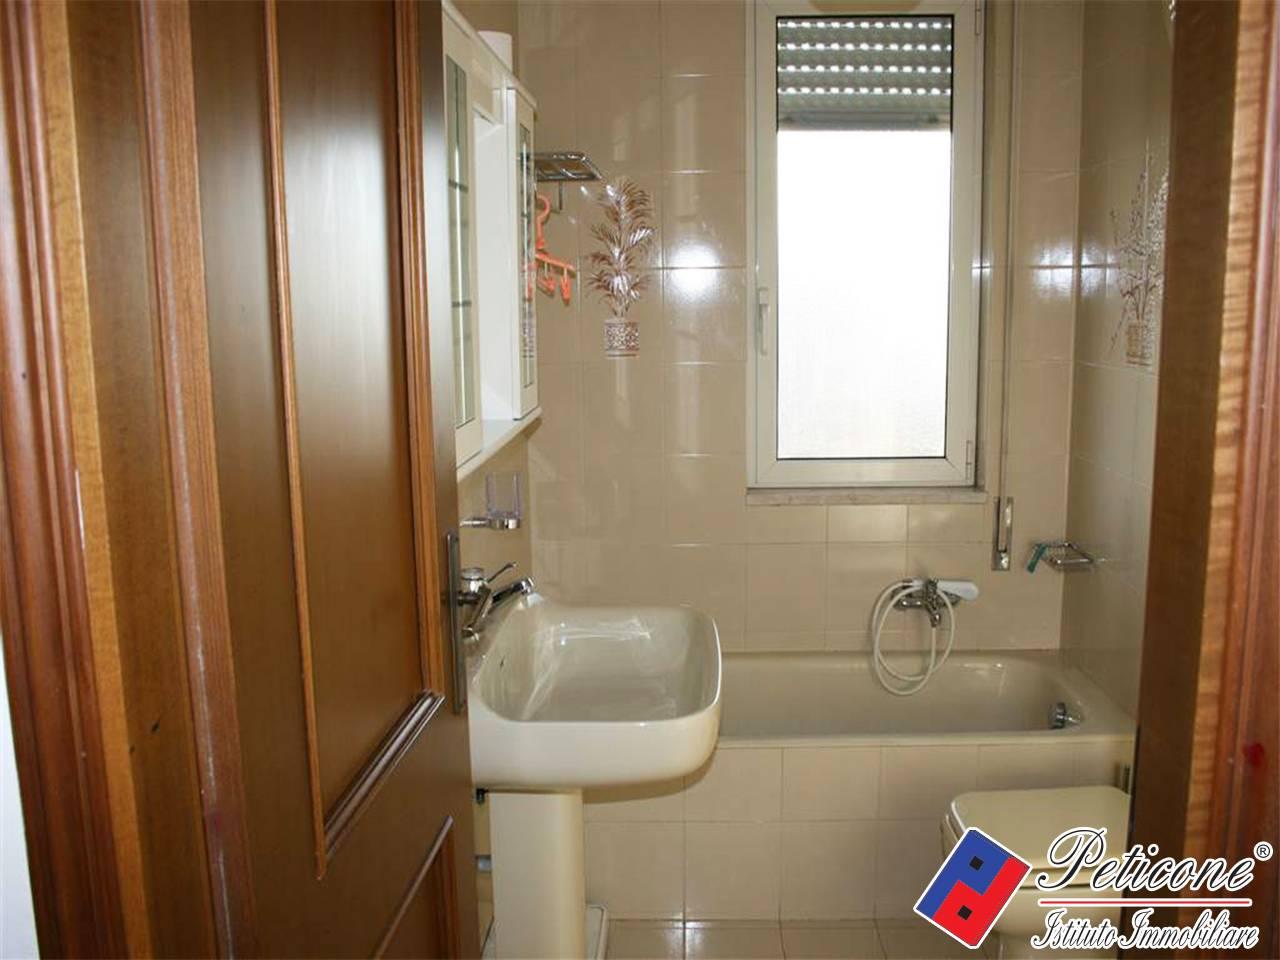 Appartamento in Vendita a Gaeta: 4 locali, 91 mq - Foto 8